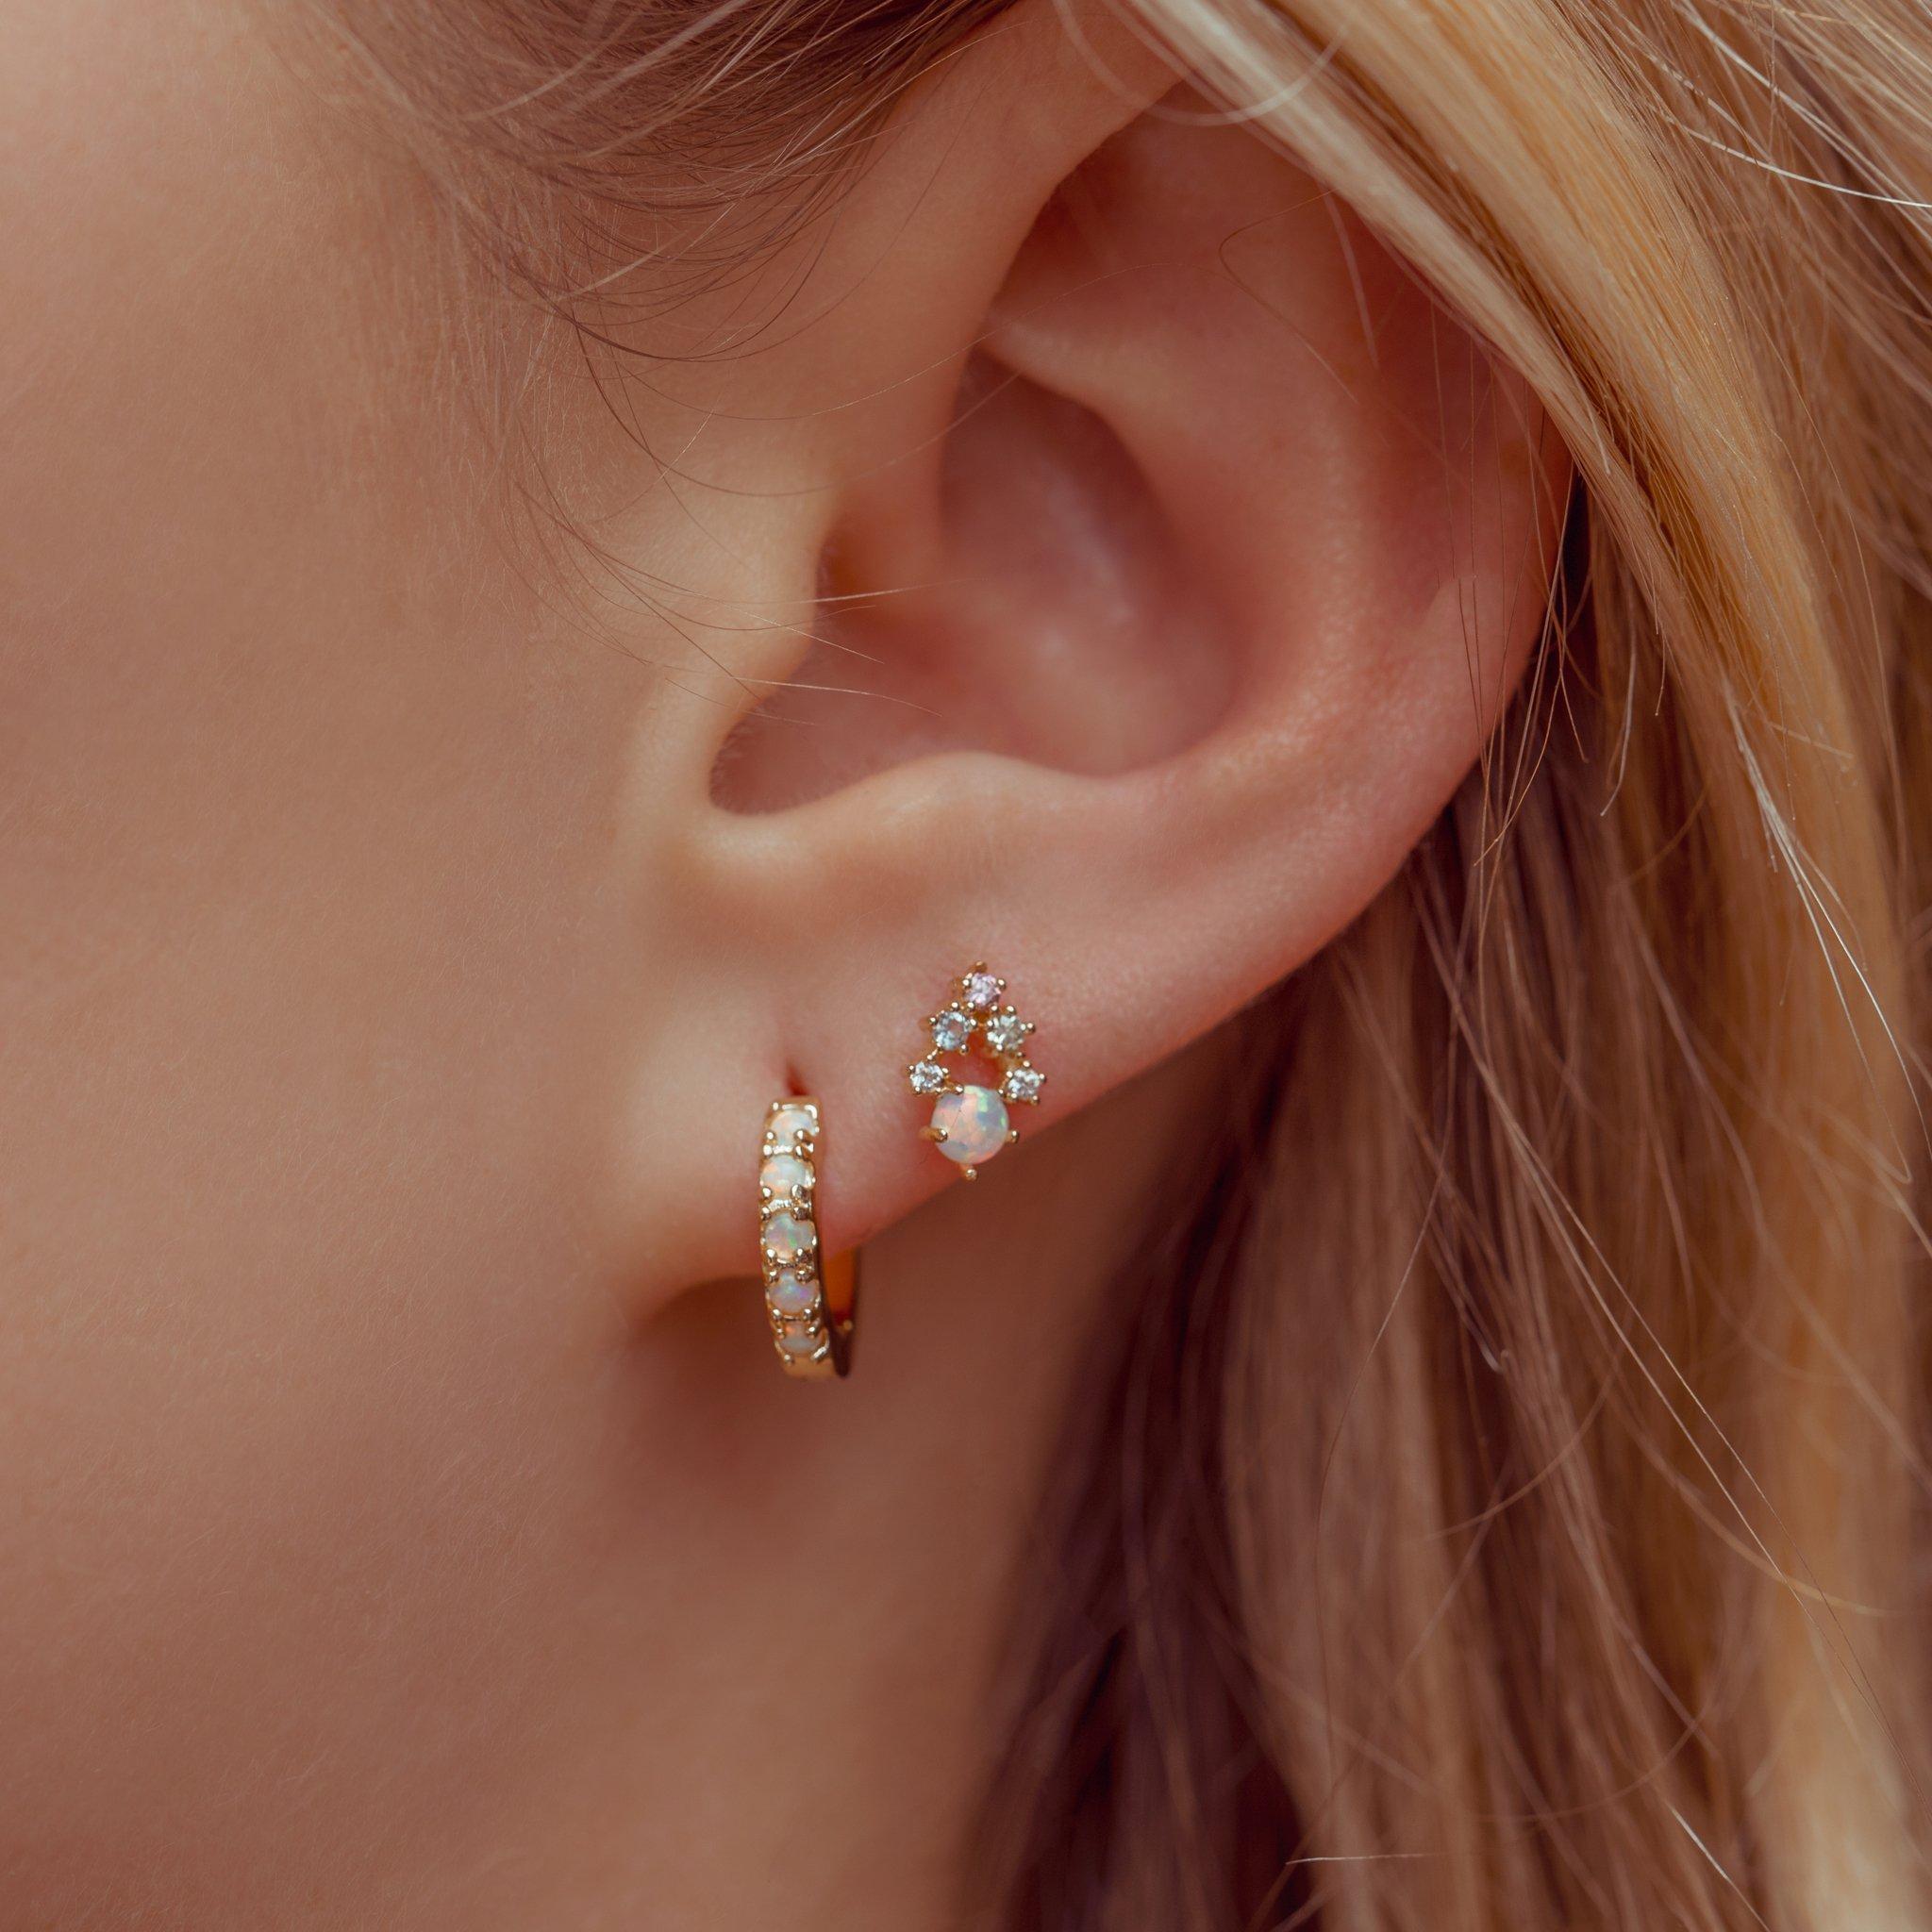 Teardrop Hoop Earrings Women Glitter Scrub Crystal Drop Hook Party Cool Stud Huggie Clip On Girls Rose Gold Or Sterling Silver Girls Earrings